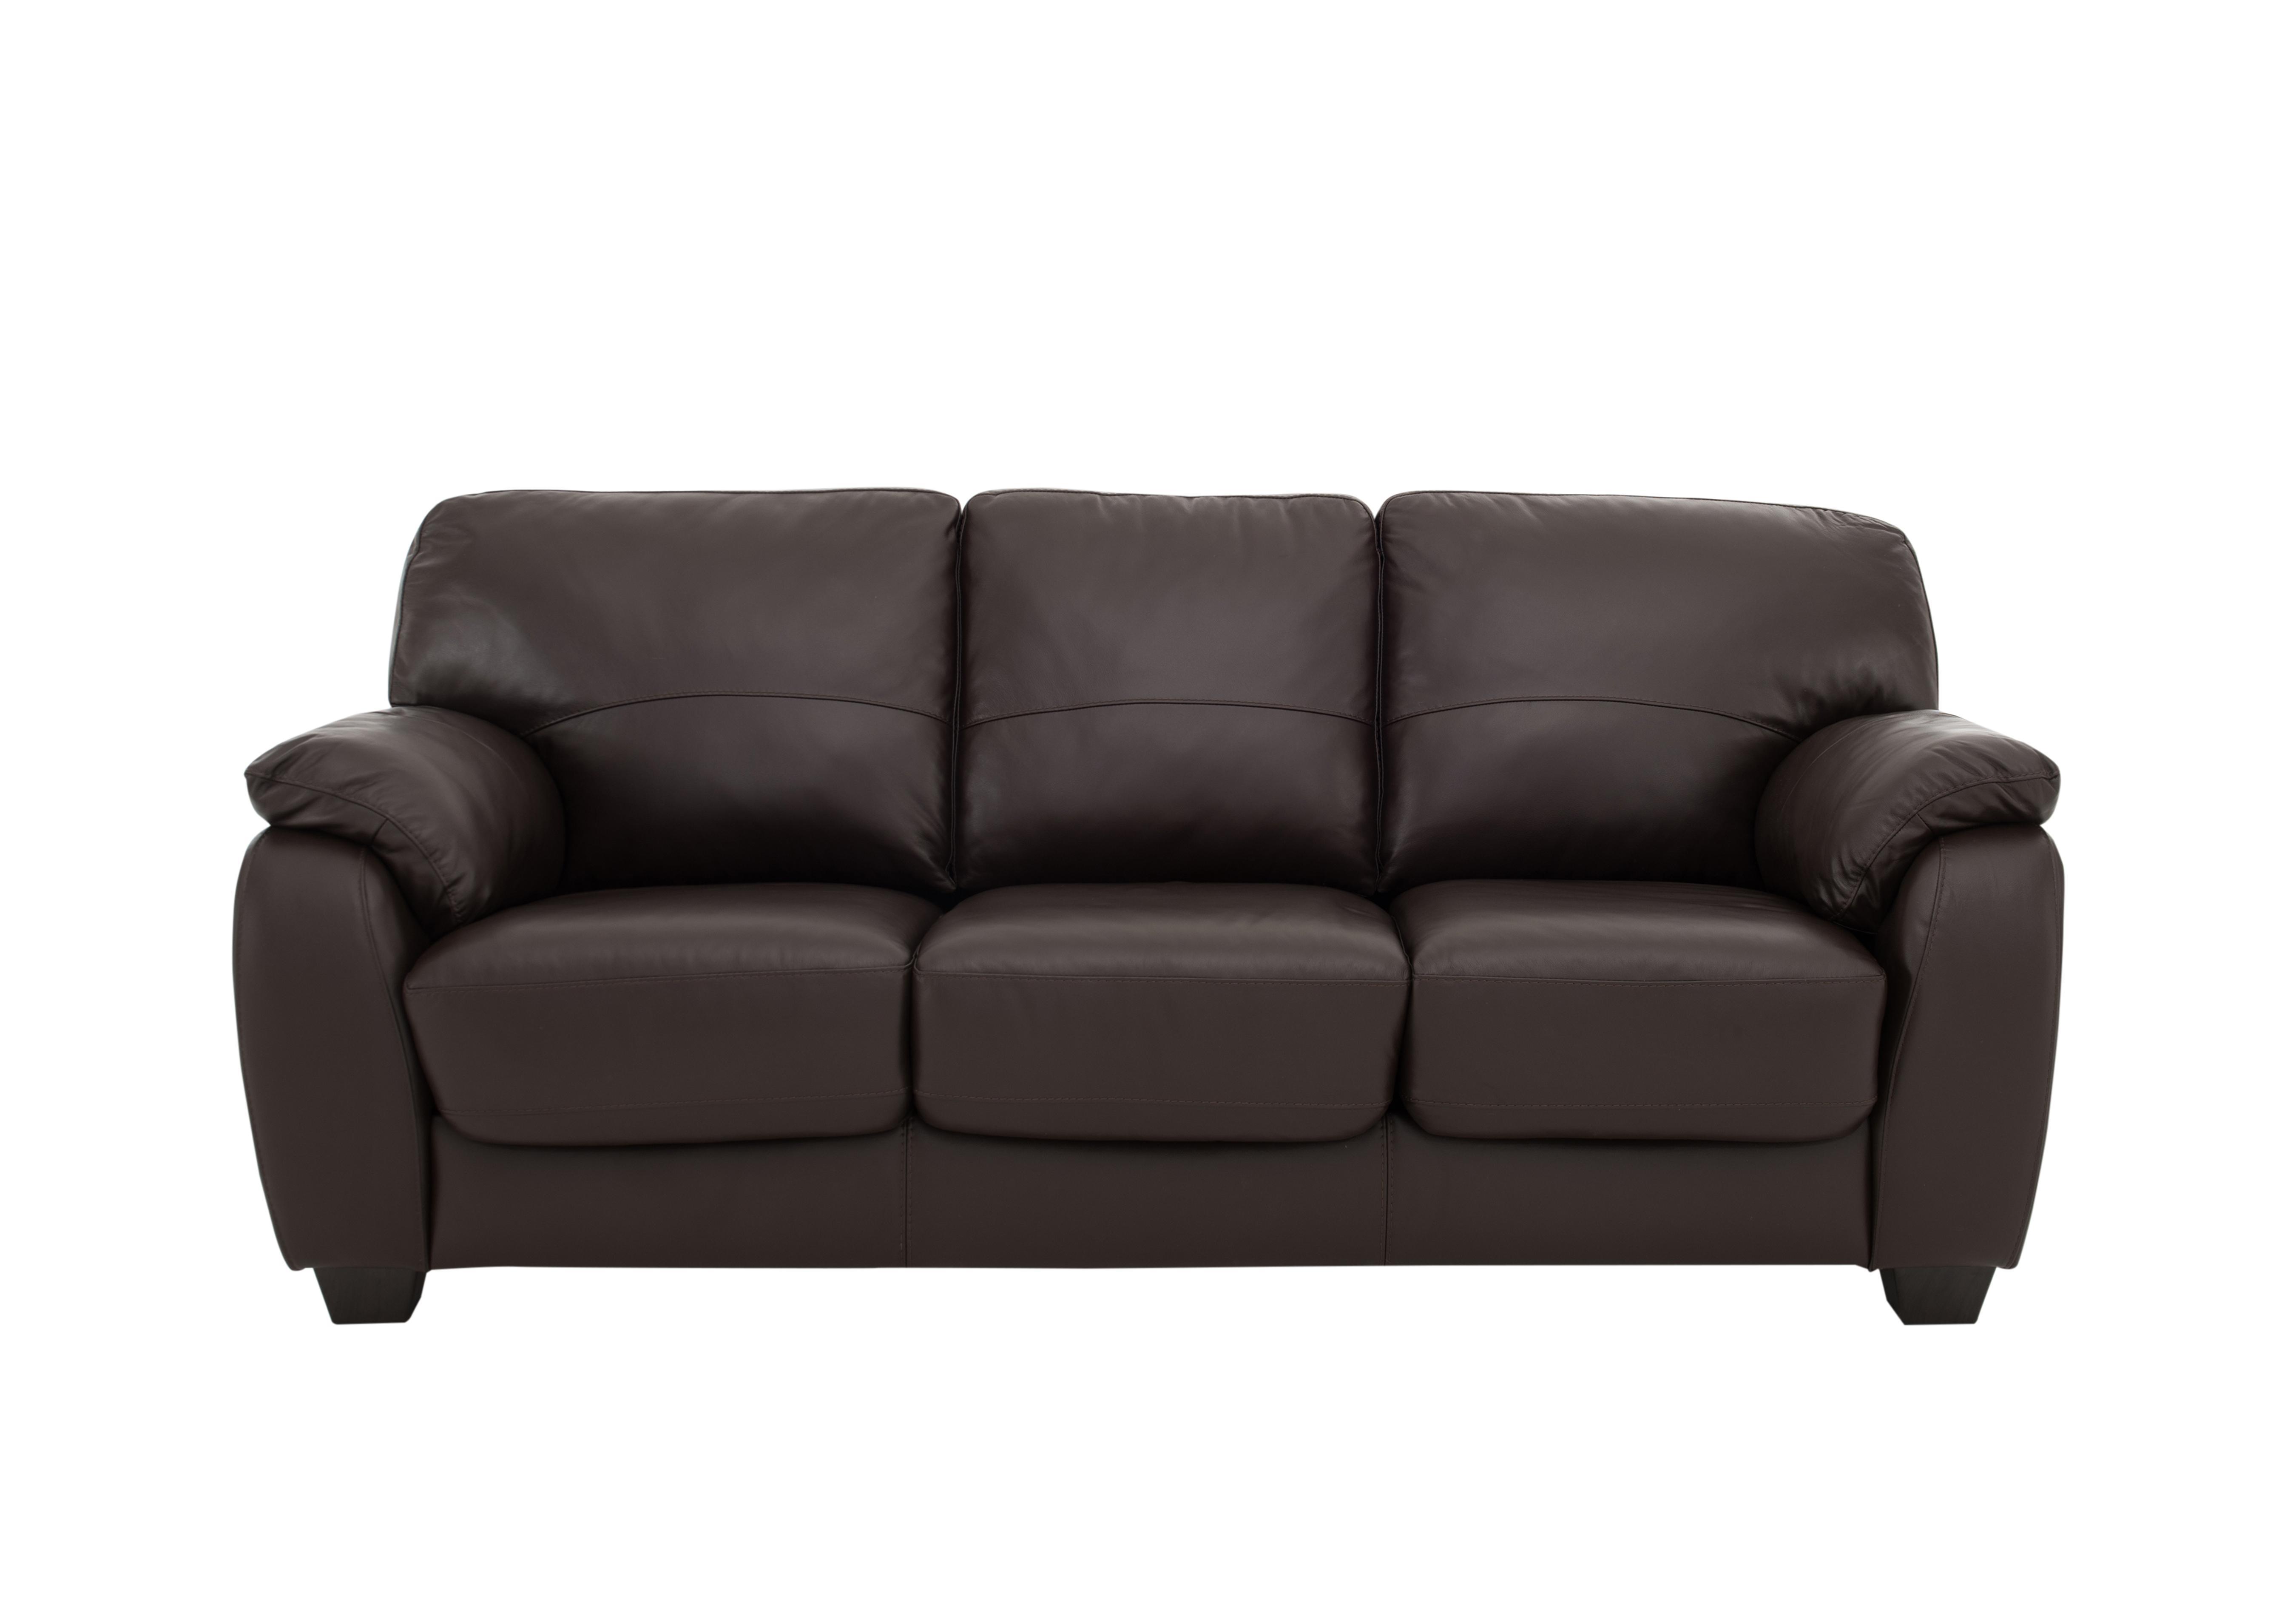 furniture village leather corner sofa bed set cheap moods reviews brokeasshome